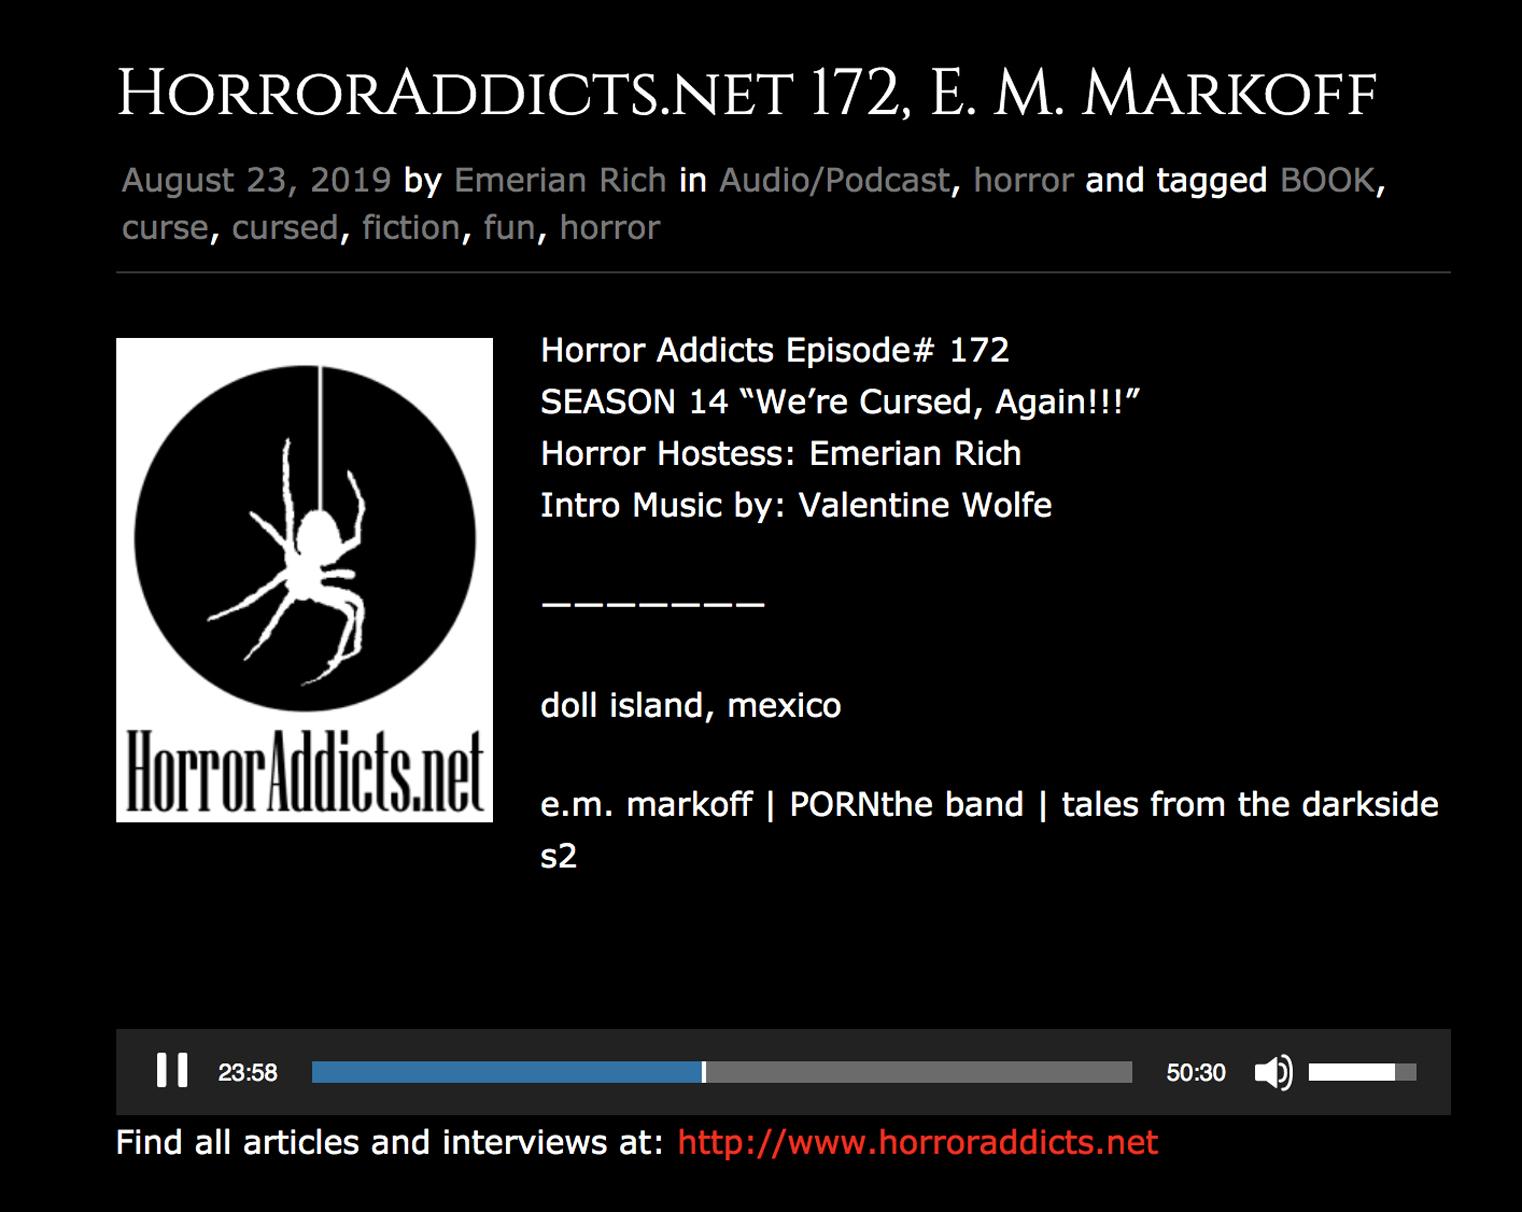 Listen:  https://horroraddicts.wordpress.com/2019/08/23/horroraddicts-net-172-e-m-markoff/